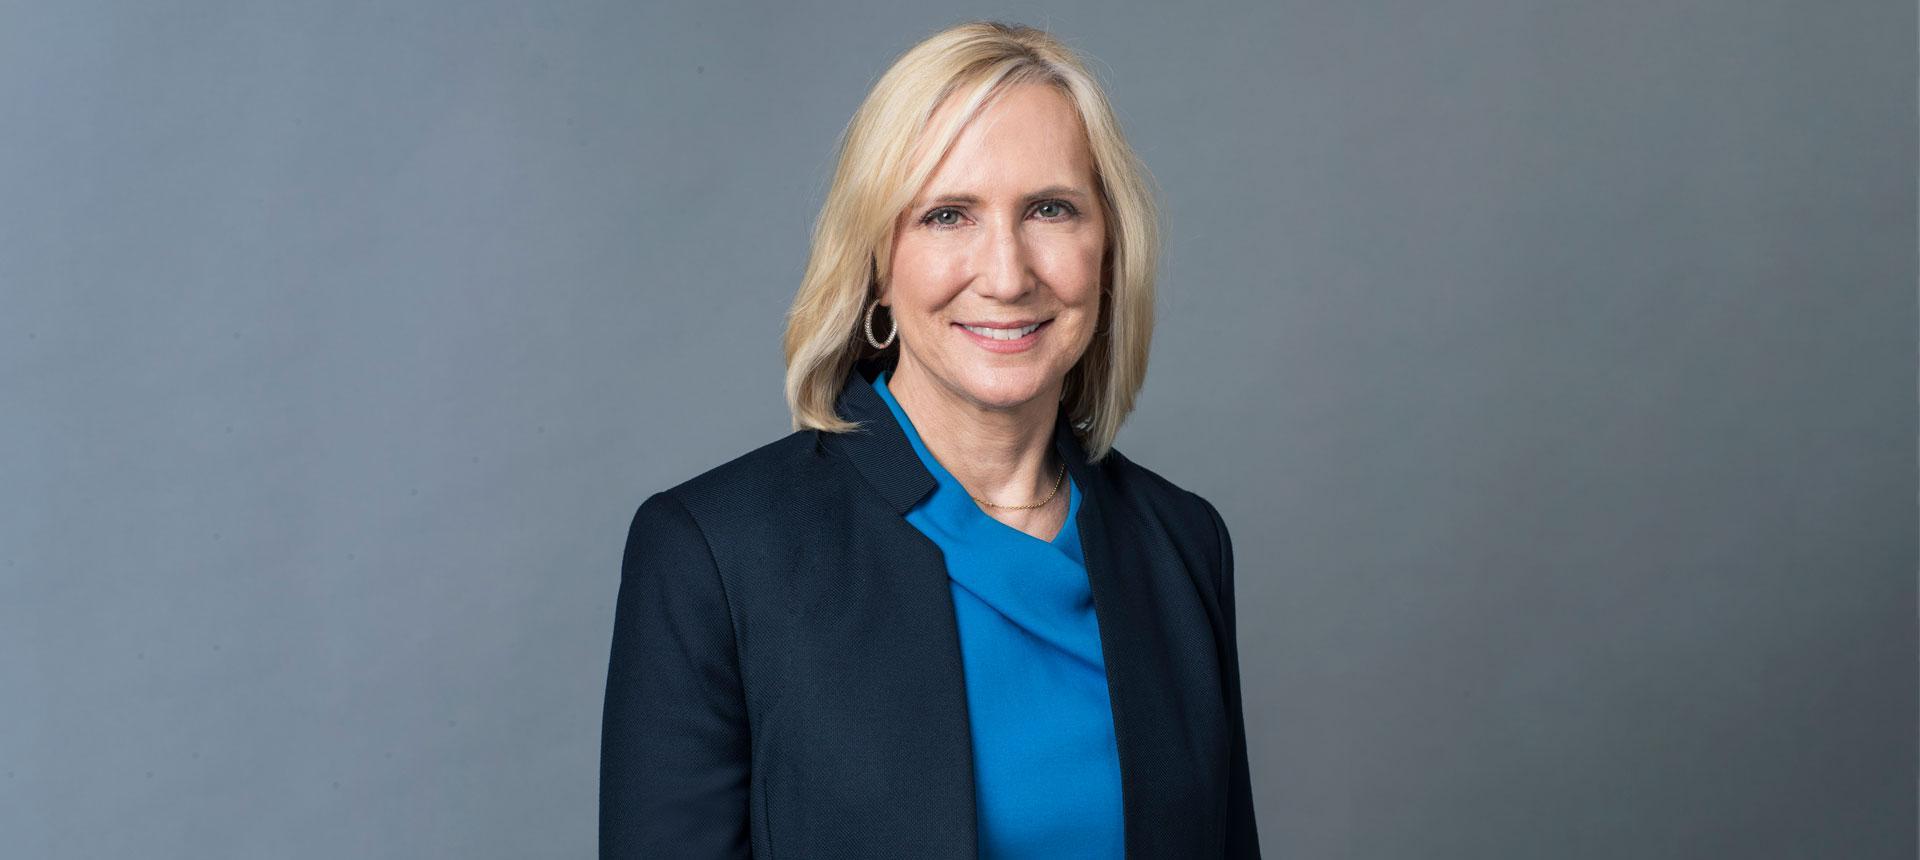 Paula Pagliaroni, VP, Compensation and Benefits